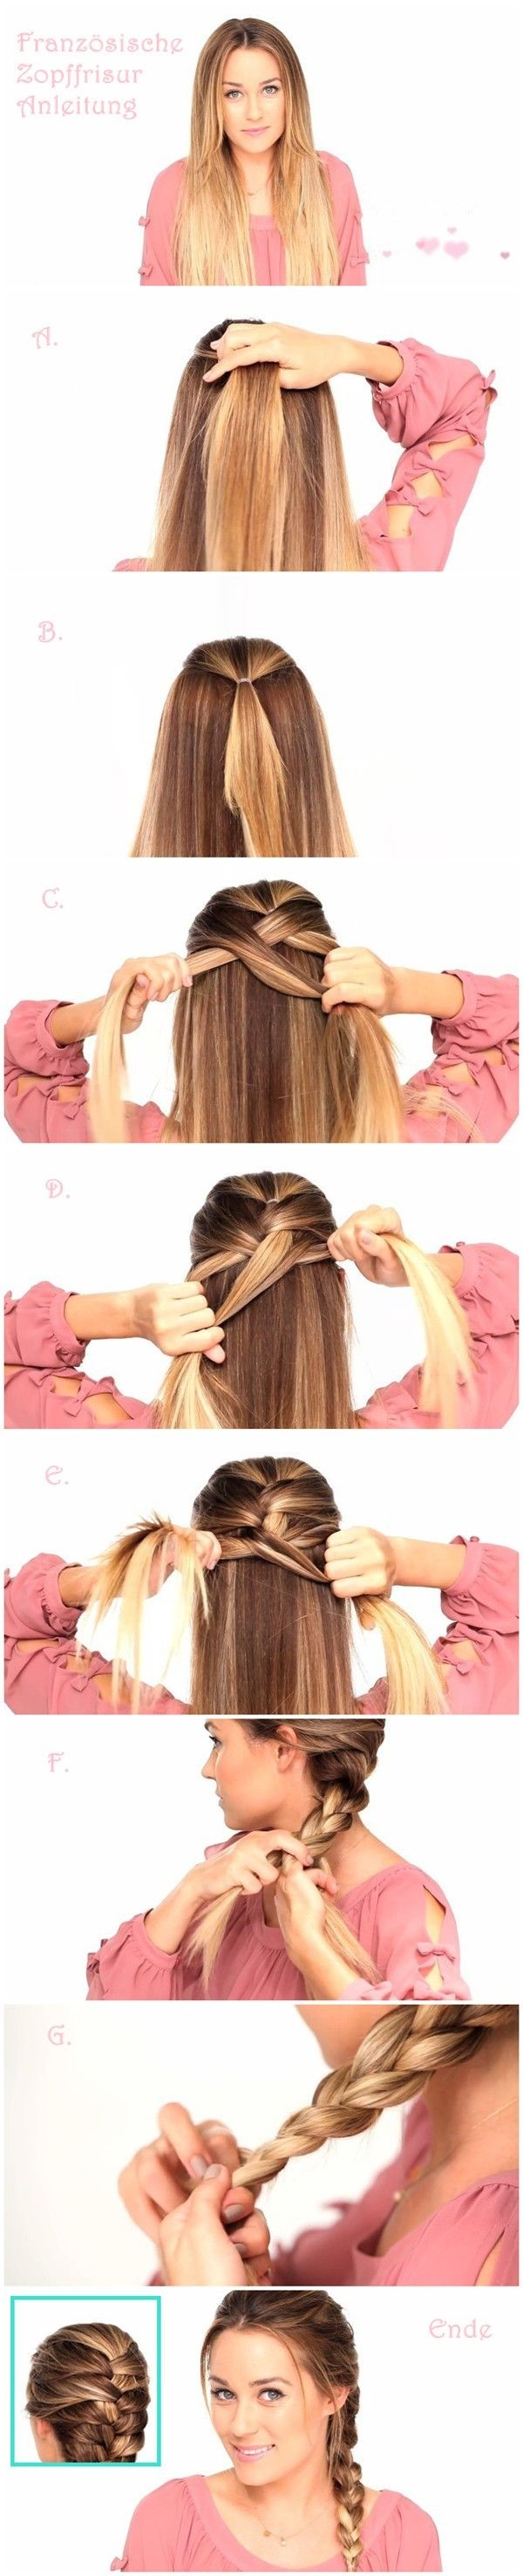 Enjoyable 10 French Braids Hairstyles Tutorials Everyday Hair Styles Hairstyles For Women Draintrainus